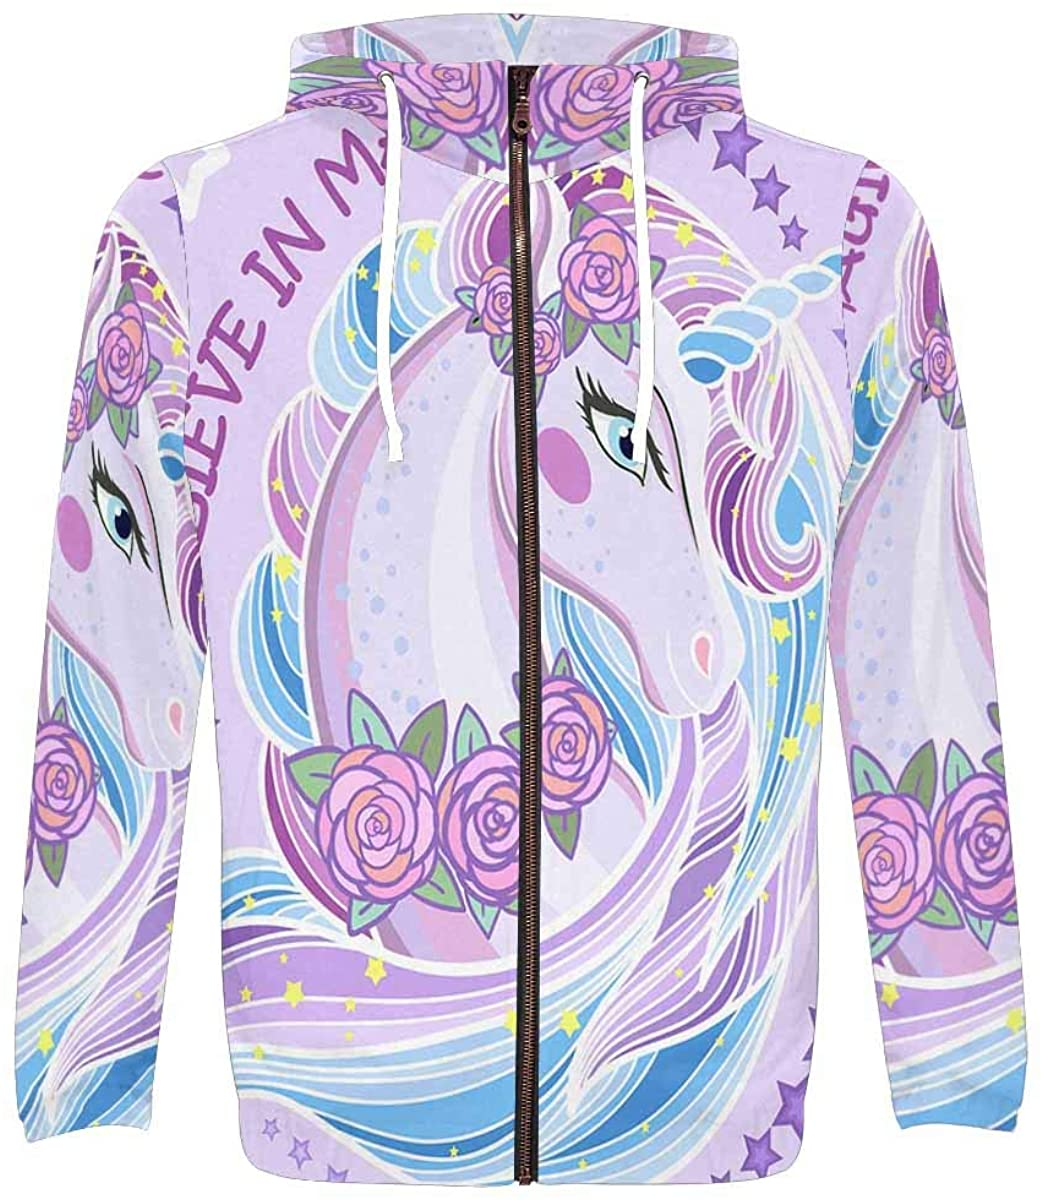 InterestPrint Mens Lightweight Full Zip Hoodie Beautiful Magic Unicorn with Roses